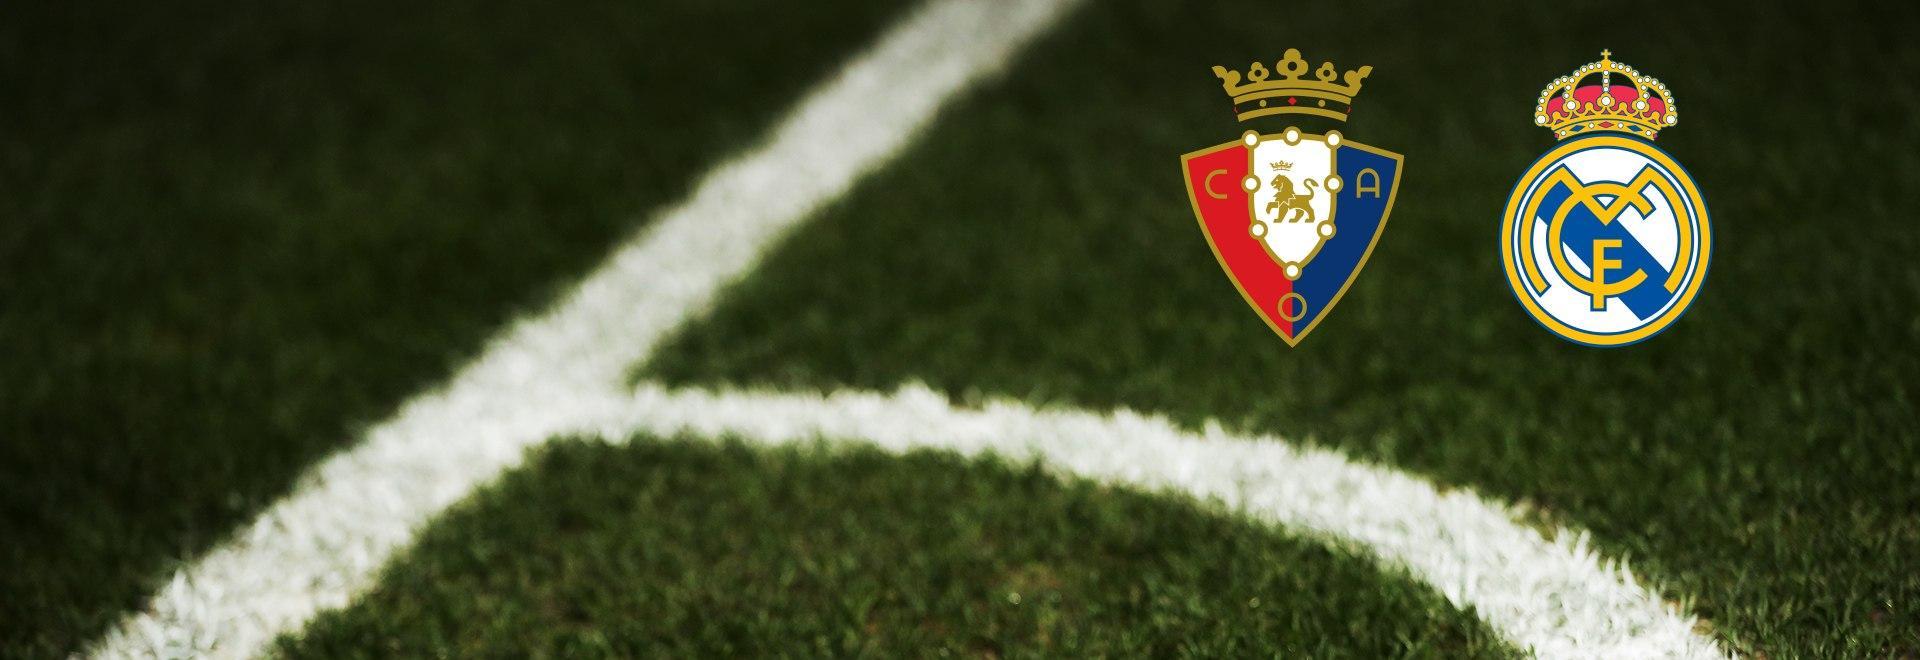 Osasuna - Real Madrid. 18a g.